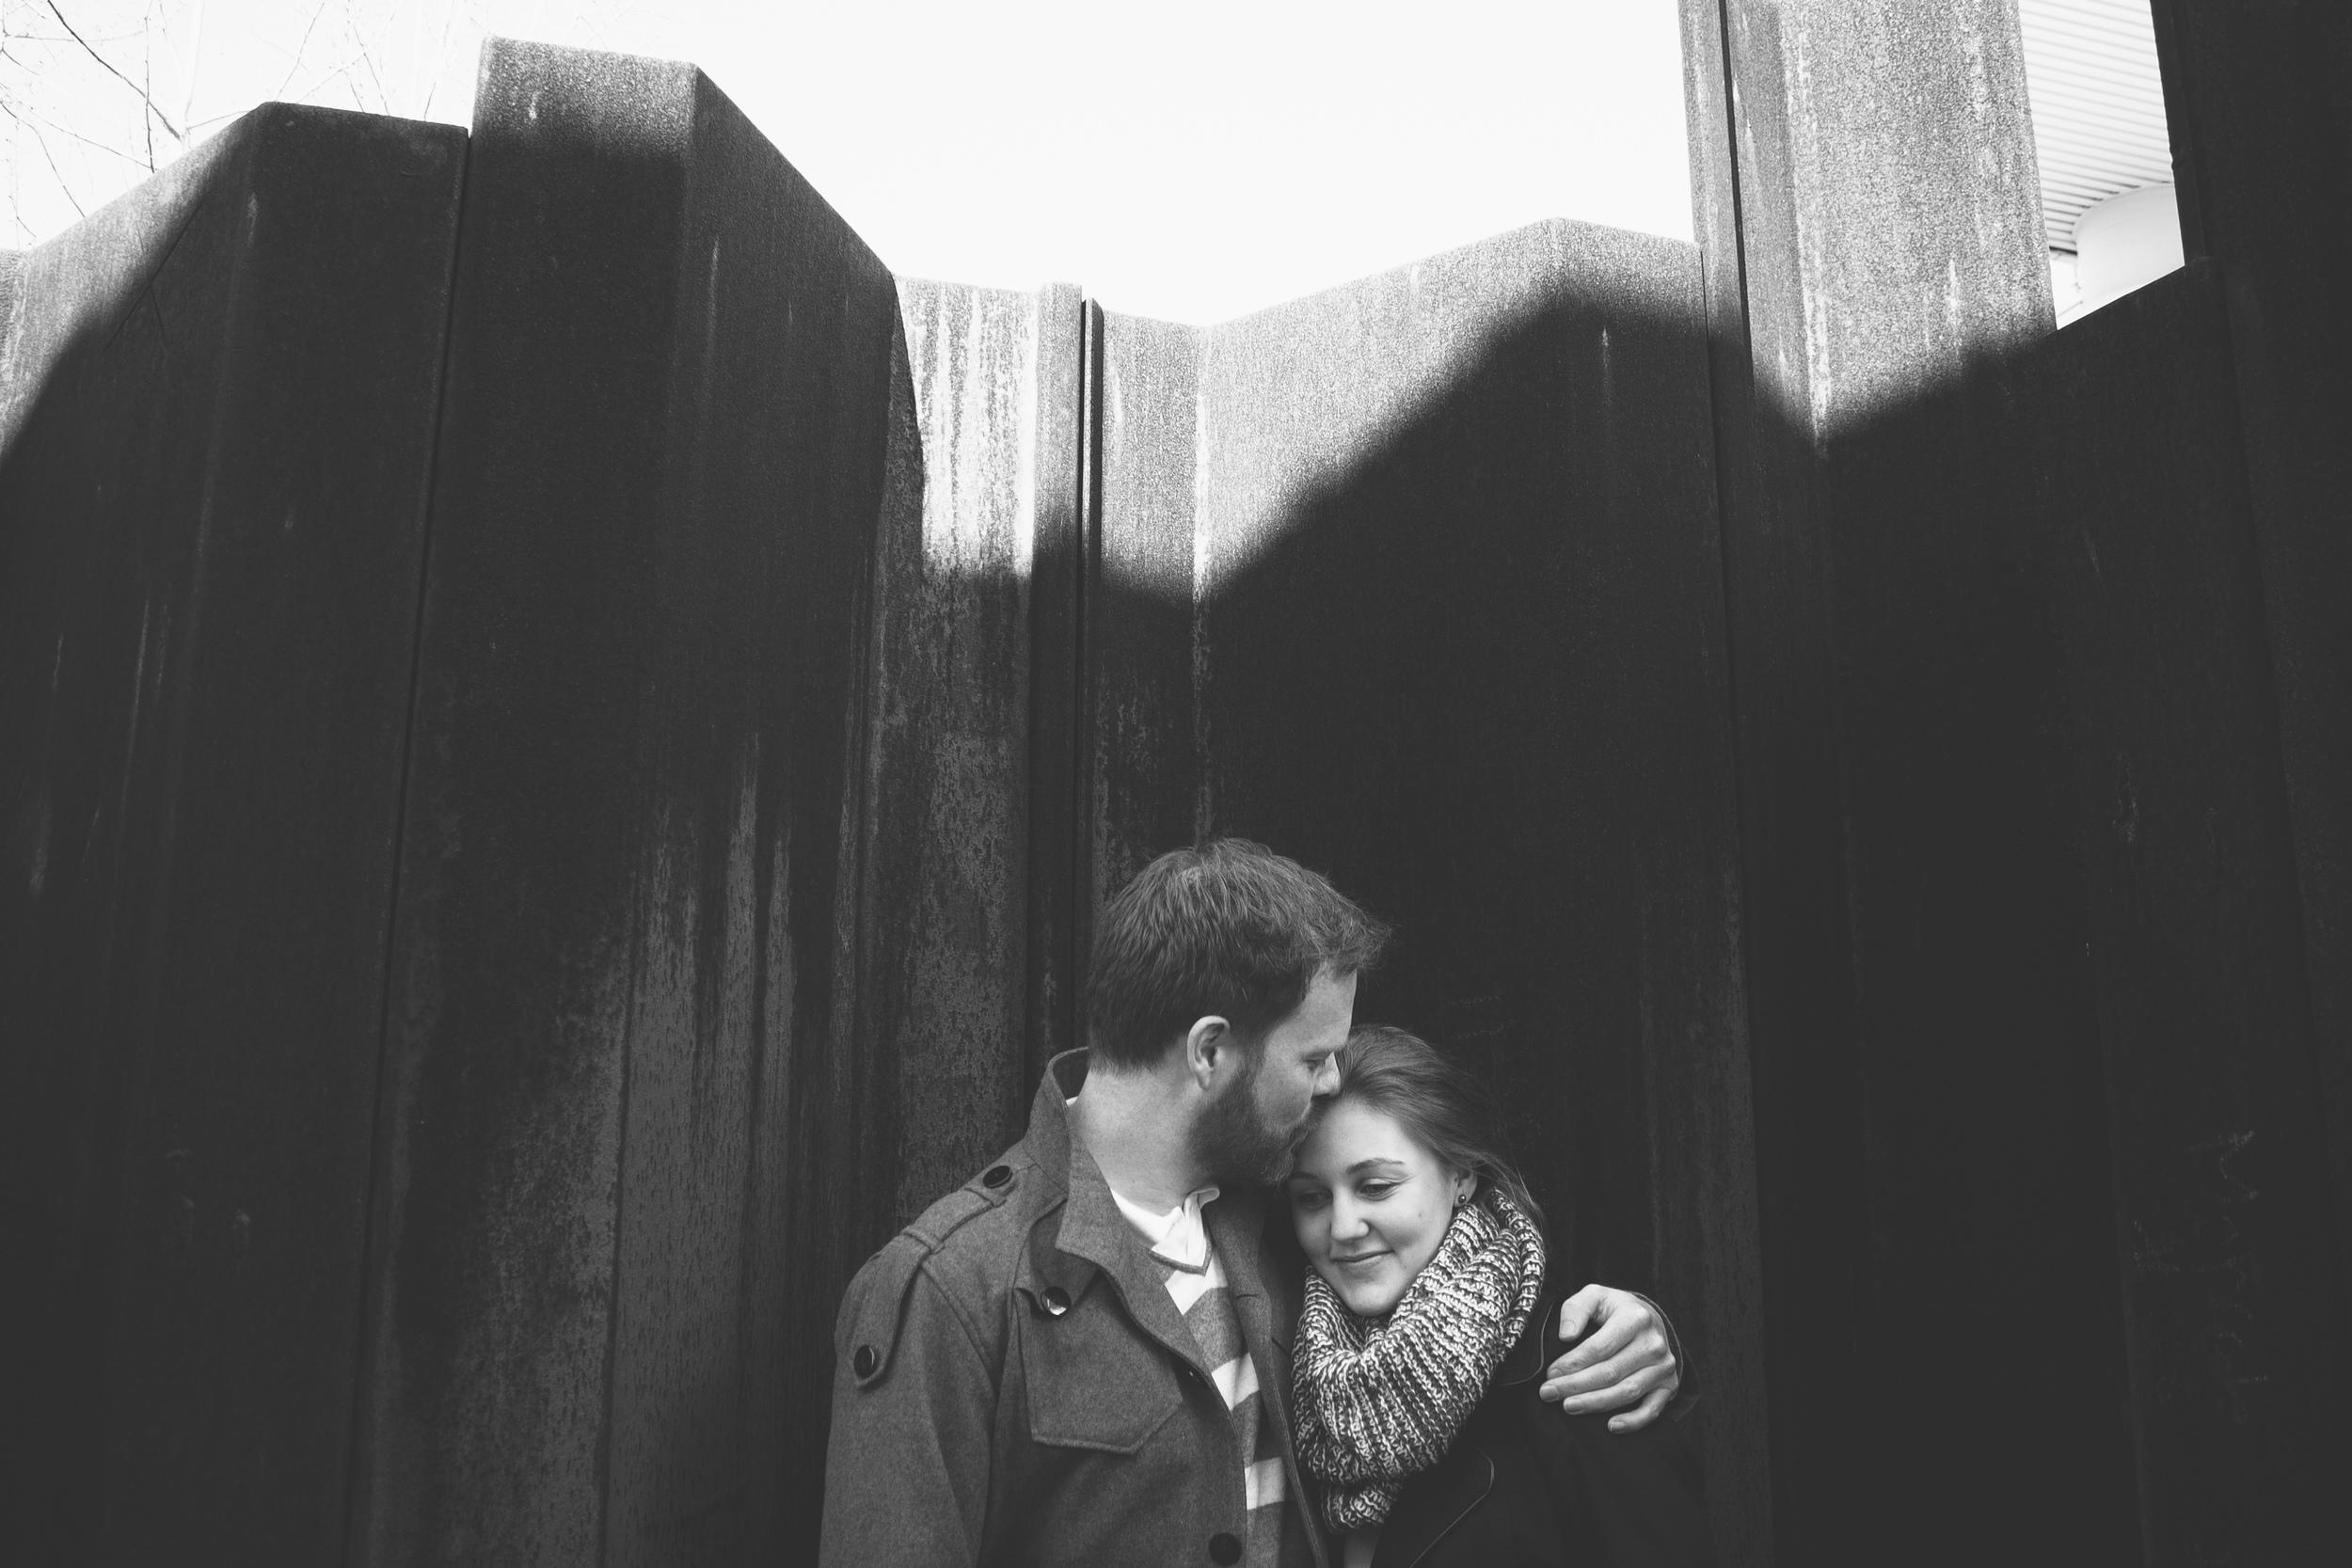 vancouver_photographer_couple_engagement_rk-2.jpg